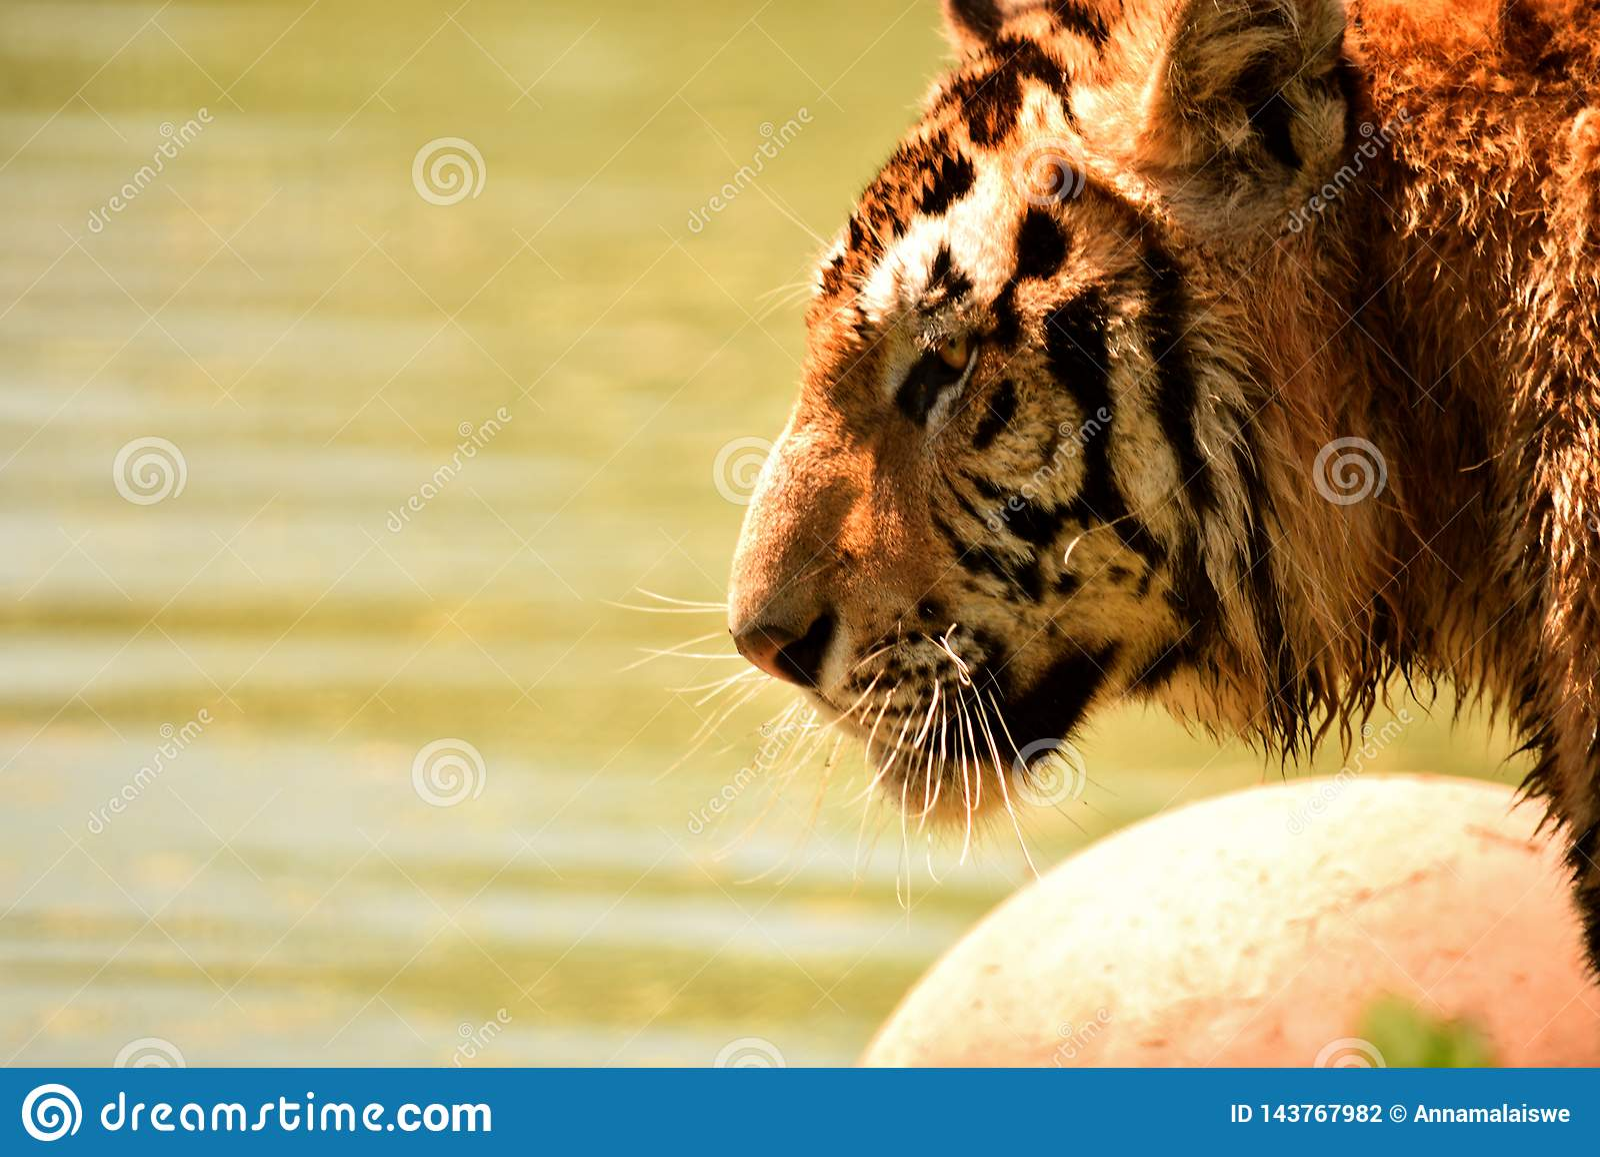 Tiger in wilderness